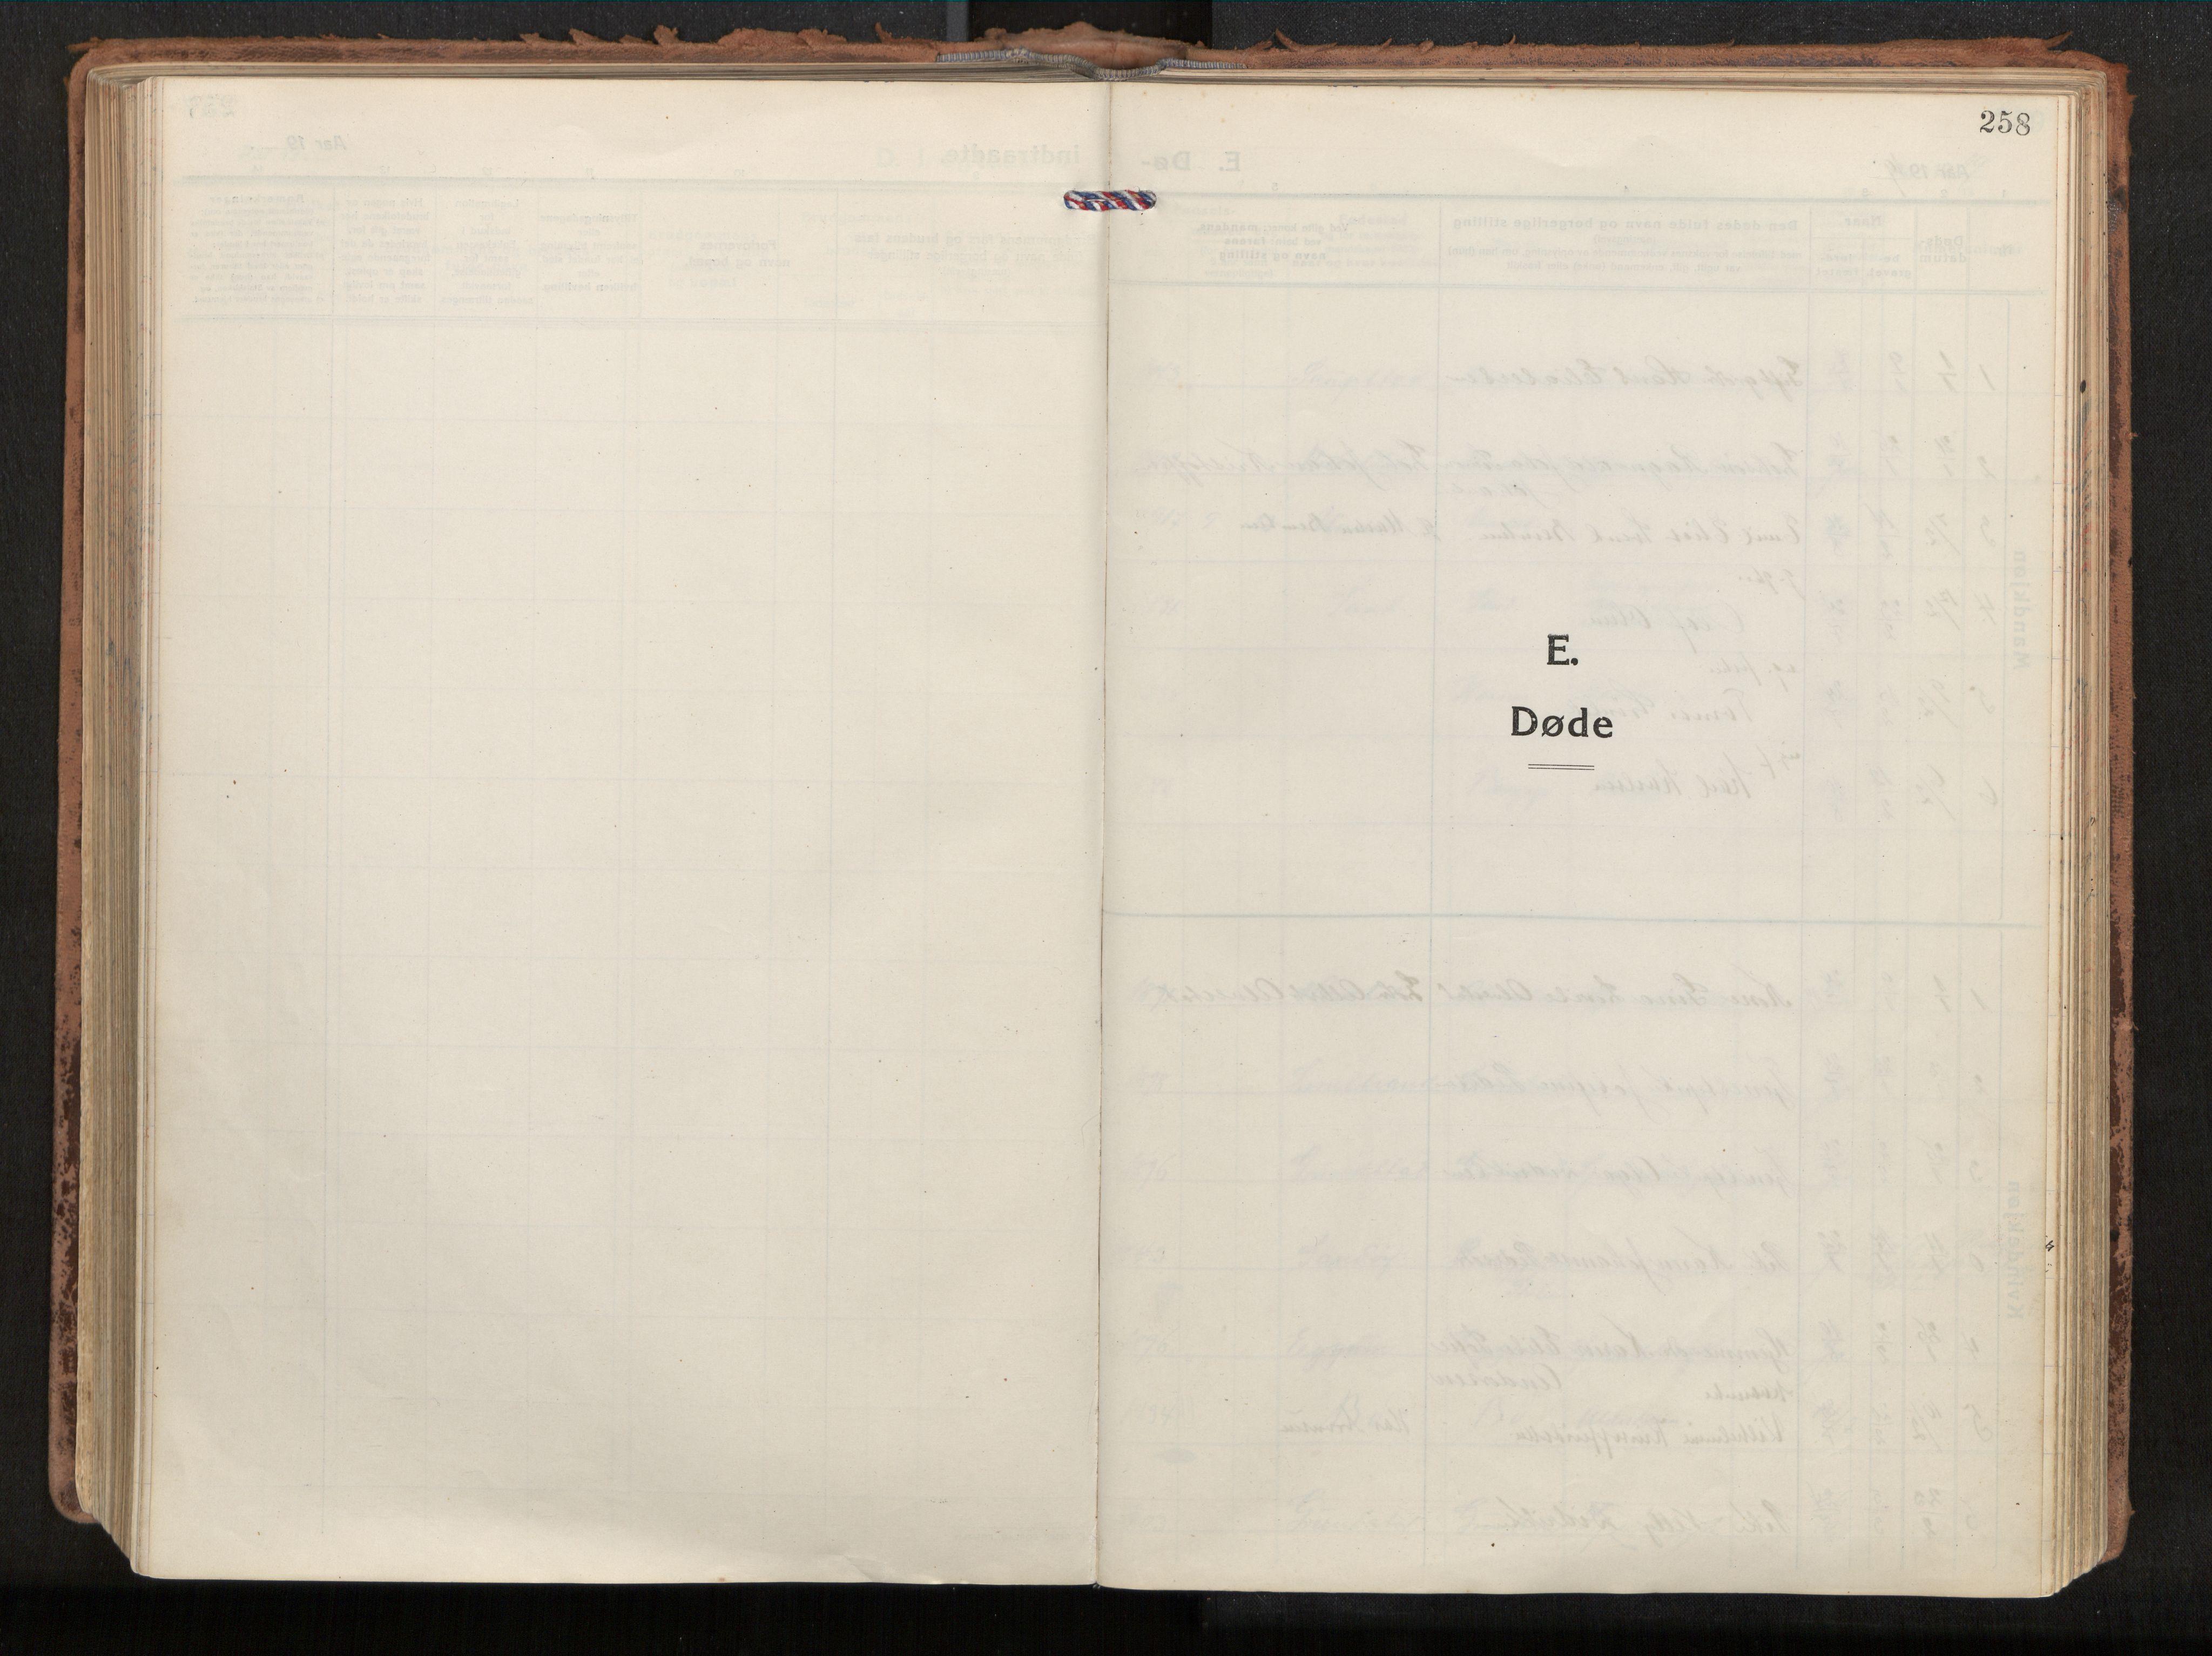 SAT, Ministerialprotokoller, klokkerbøker og fødselsregistre - Nordland, 880/L1136: Ministerialbok nr. 880A10, 1919-1927, s. 258